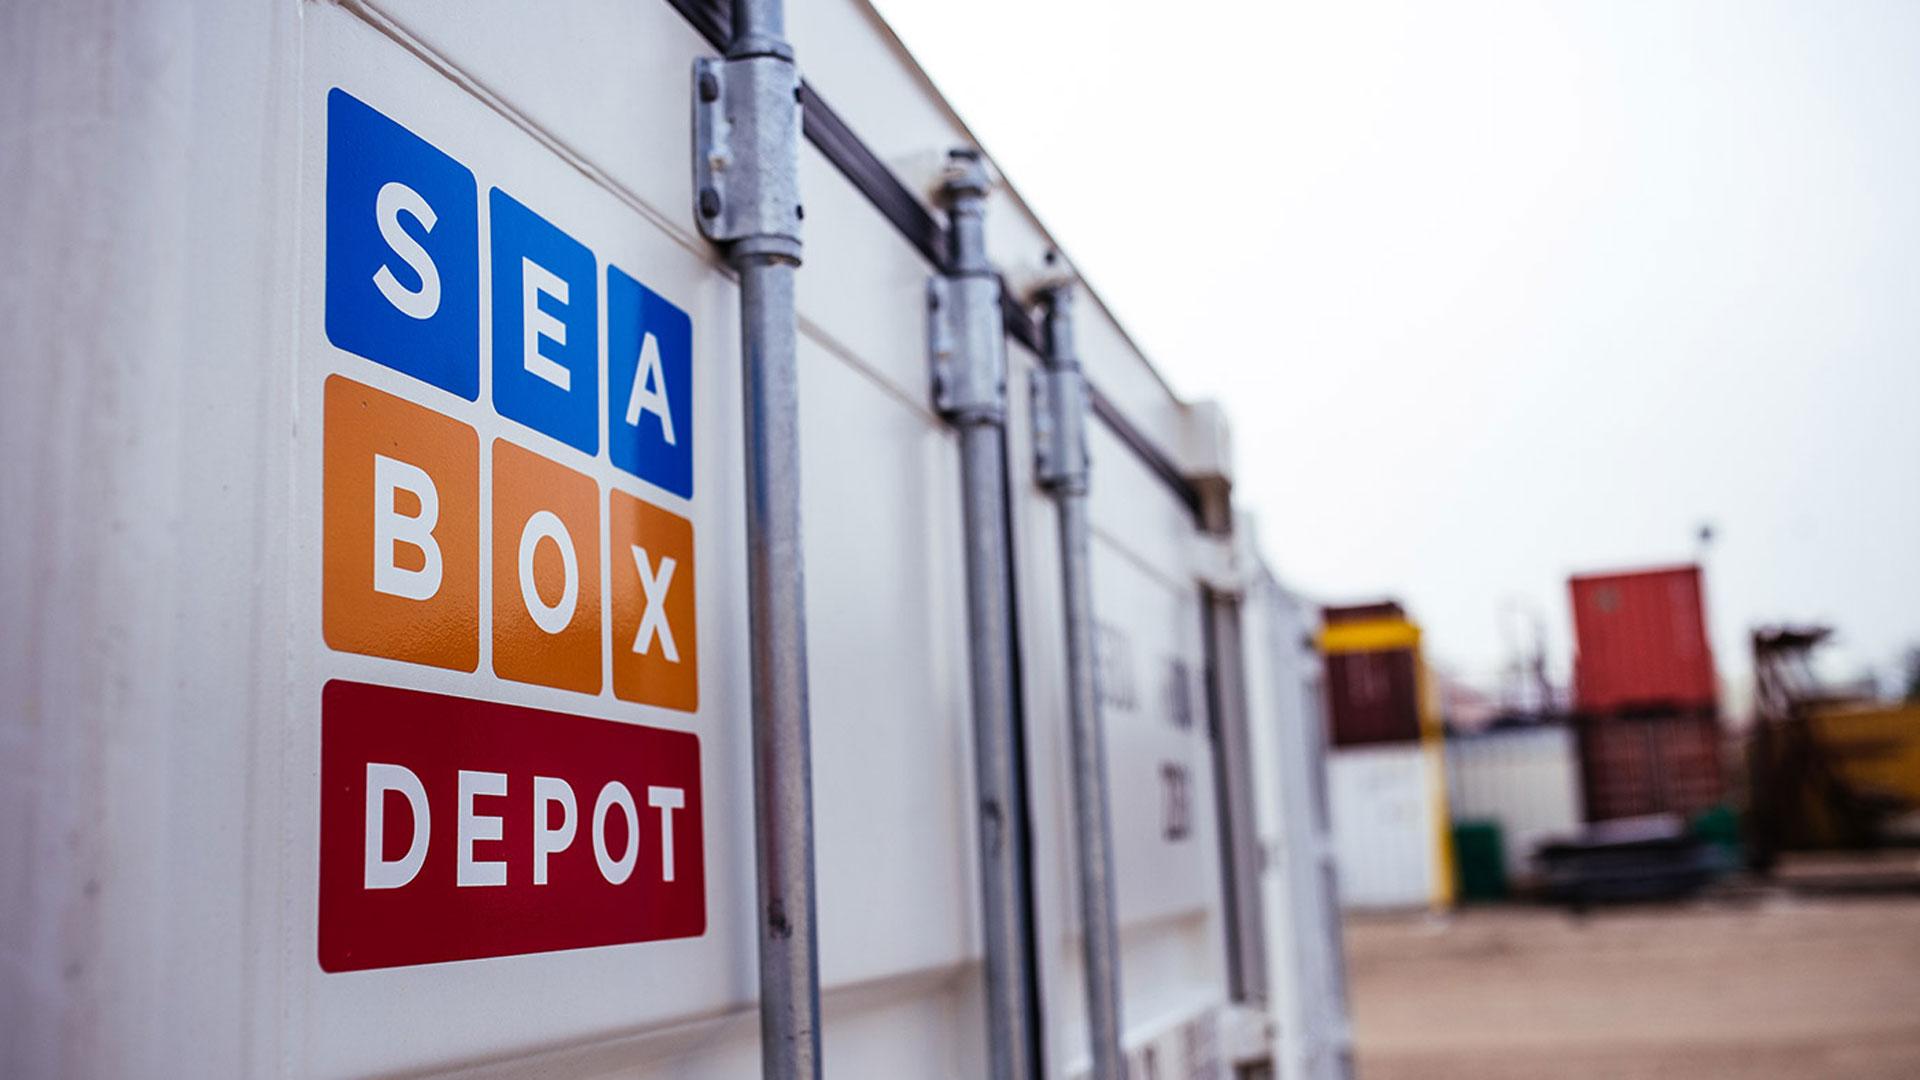 Sea Box Depot Ltd logo